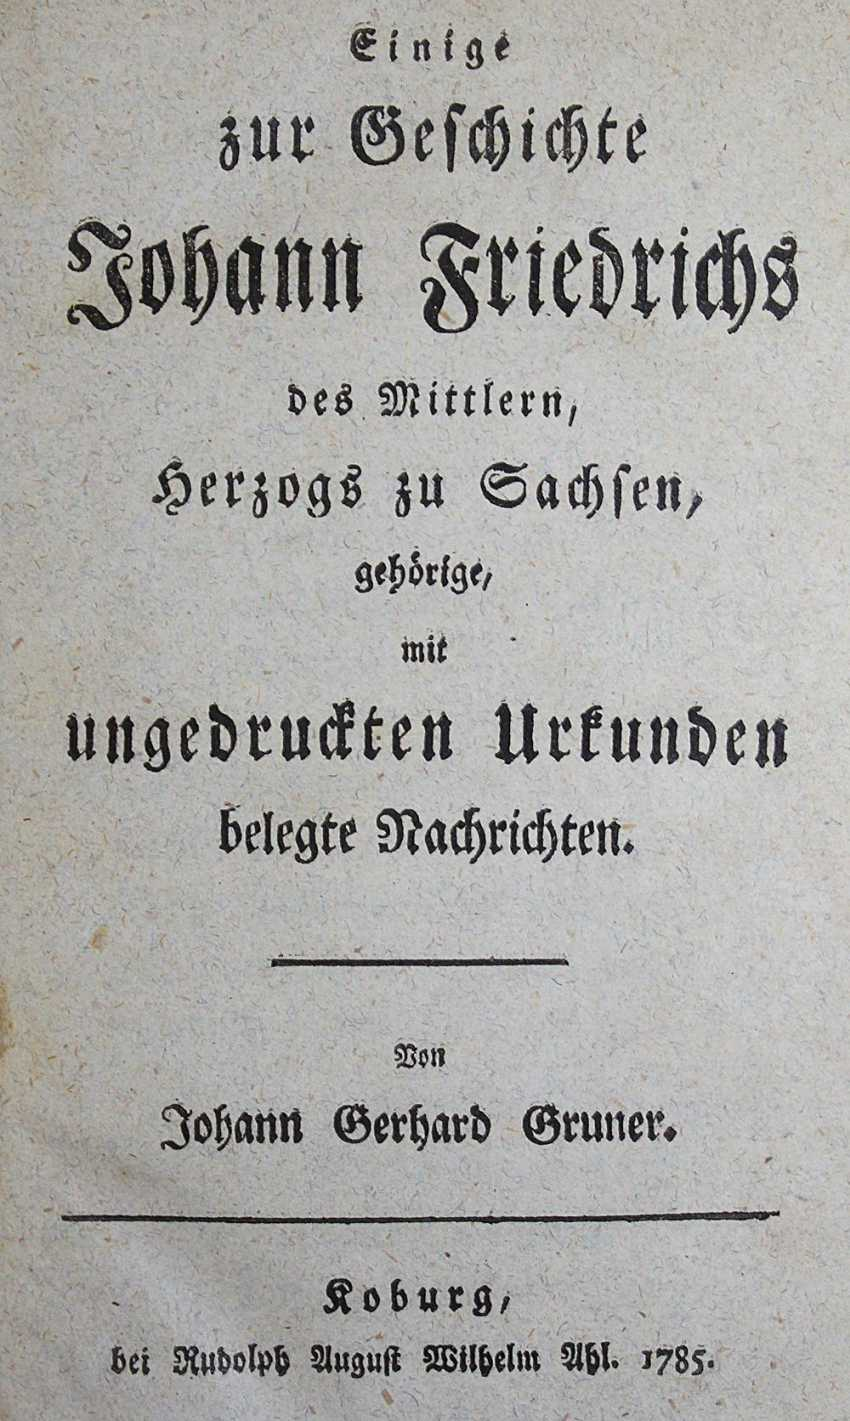 Gruner, J. G. - photo 1